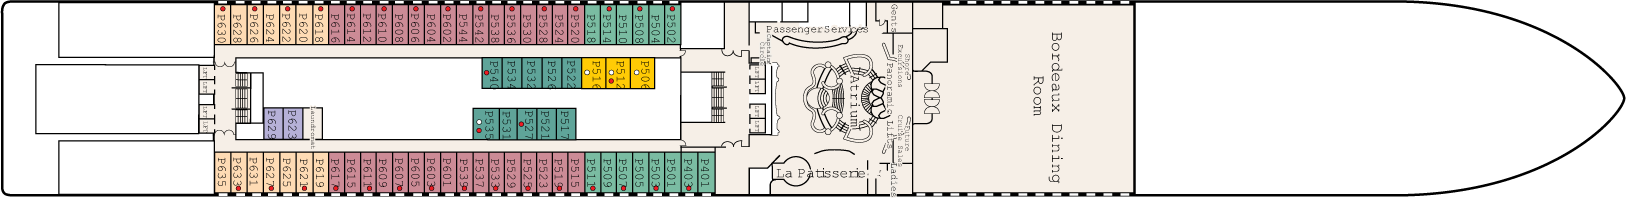 Deck 5